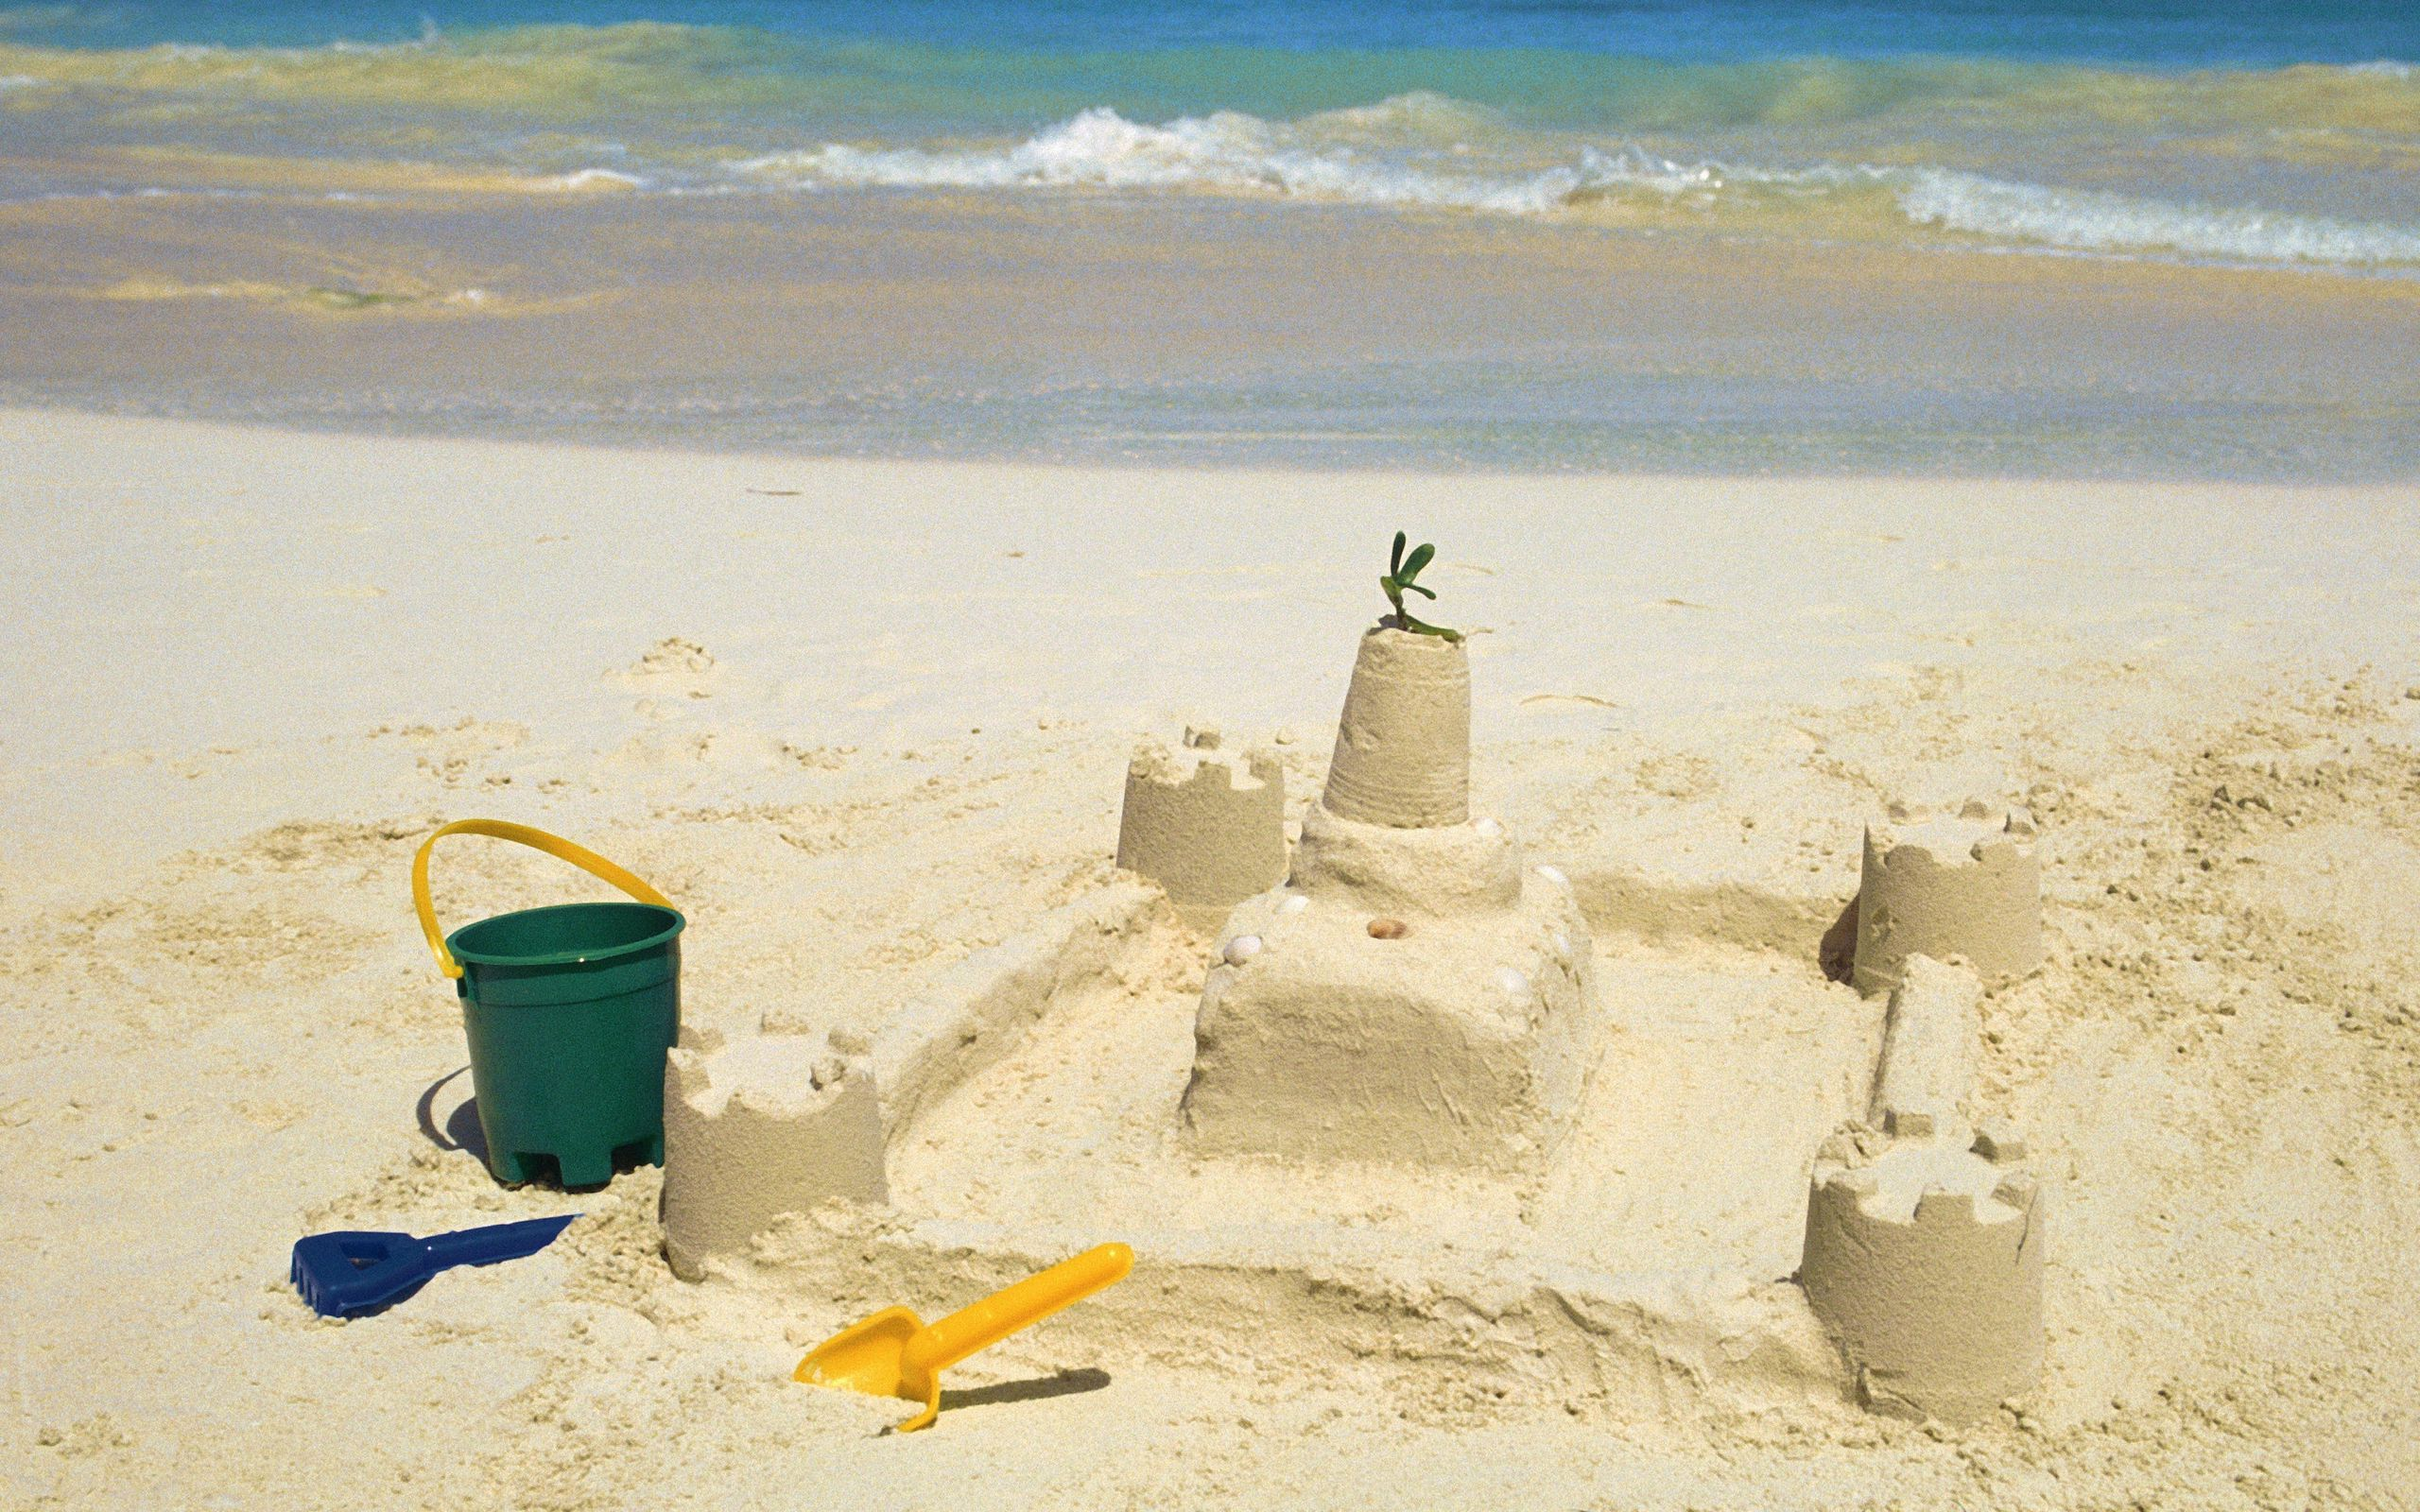 sand castle background wallpaper 71400